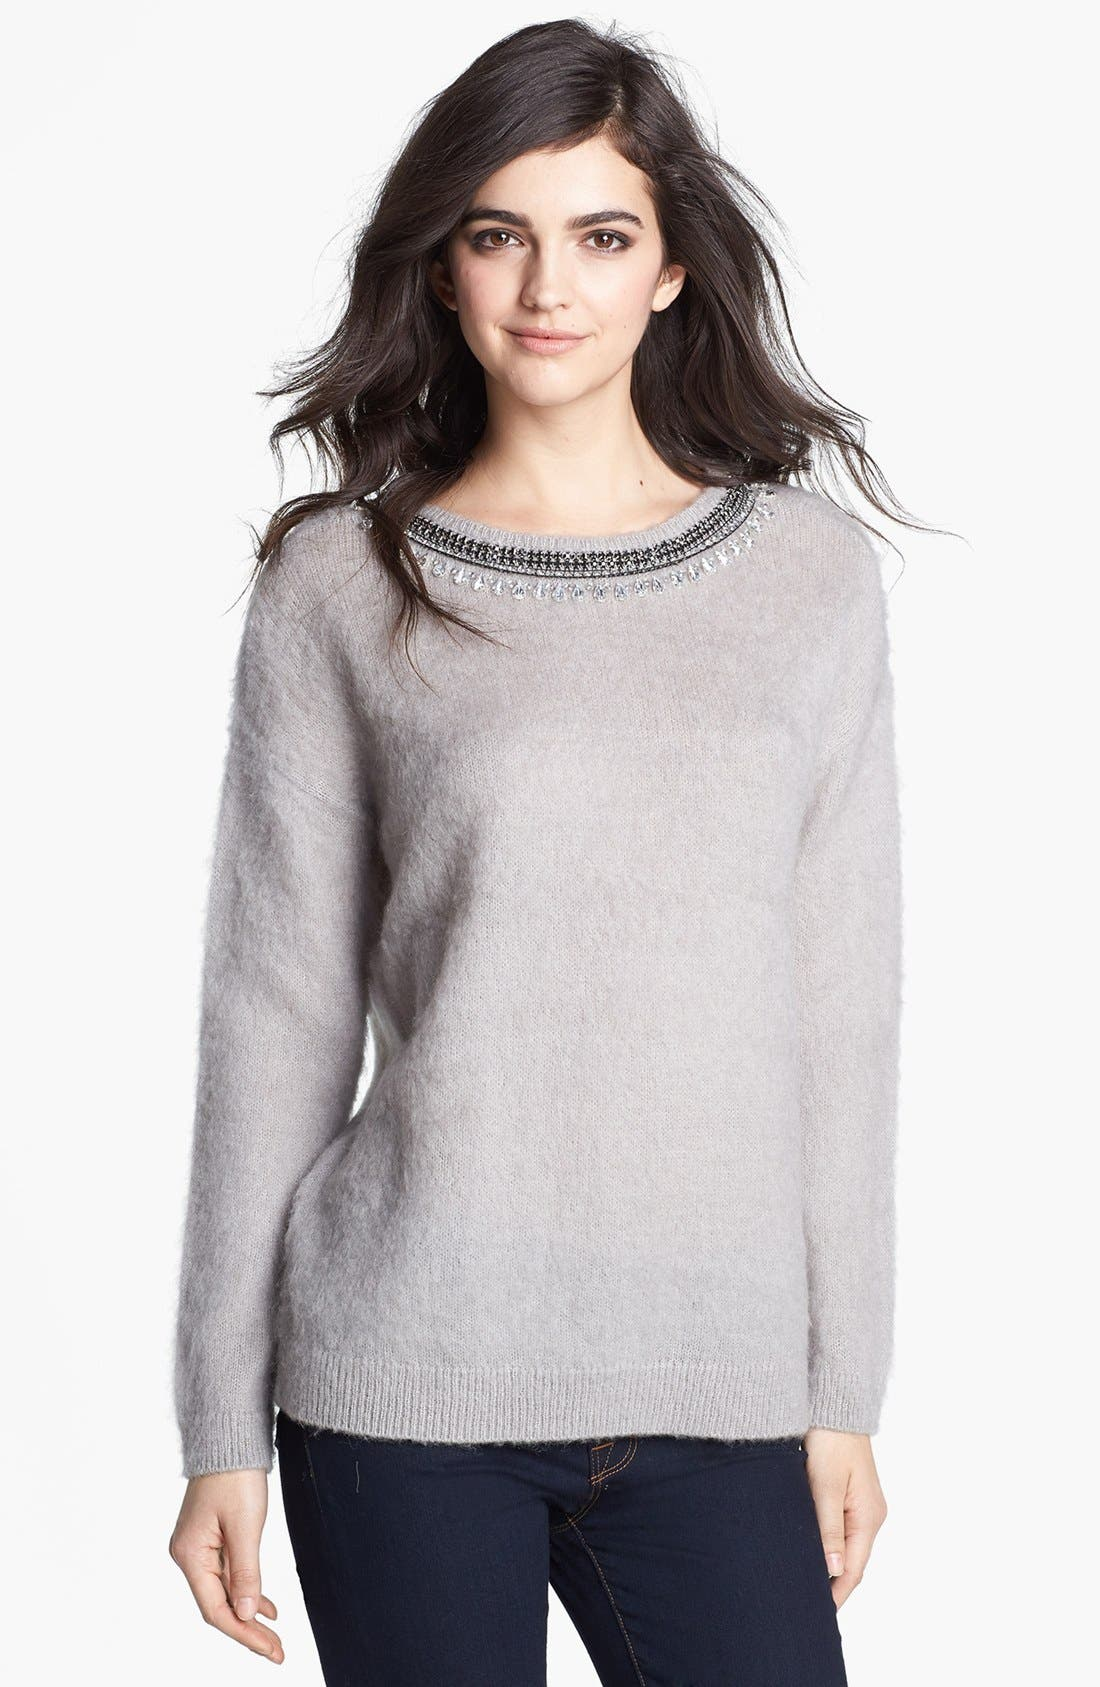 Jewel Neck Textured Sweater,                             Main thumbnail 1, color,                             020